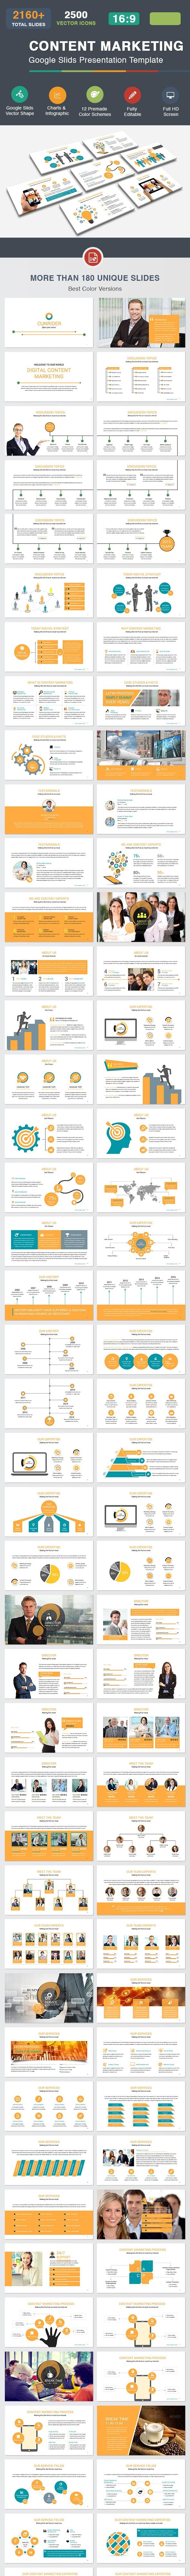 Content Marketing Google Slides Template - Google Slides Presentation Templates